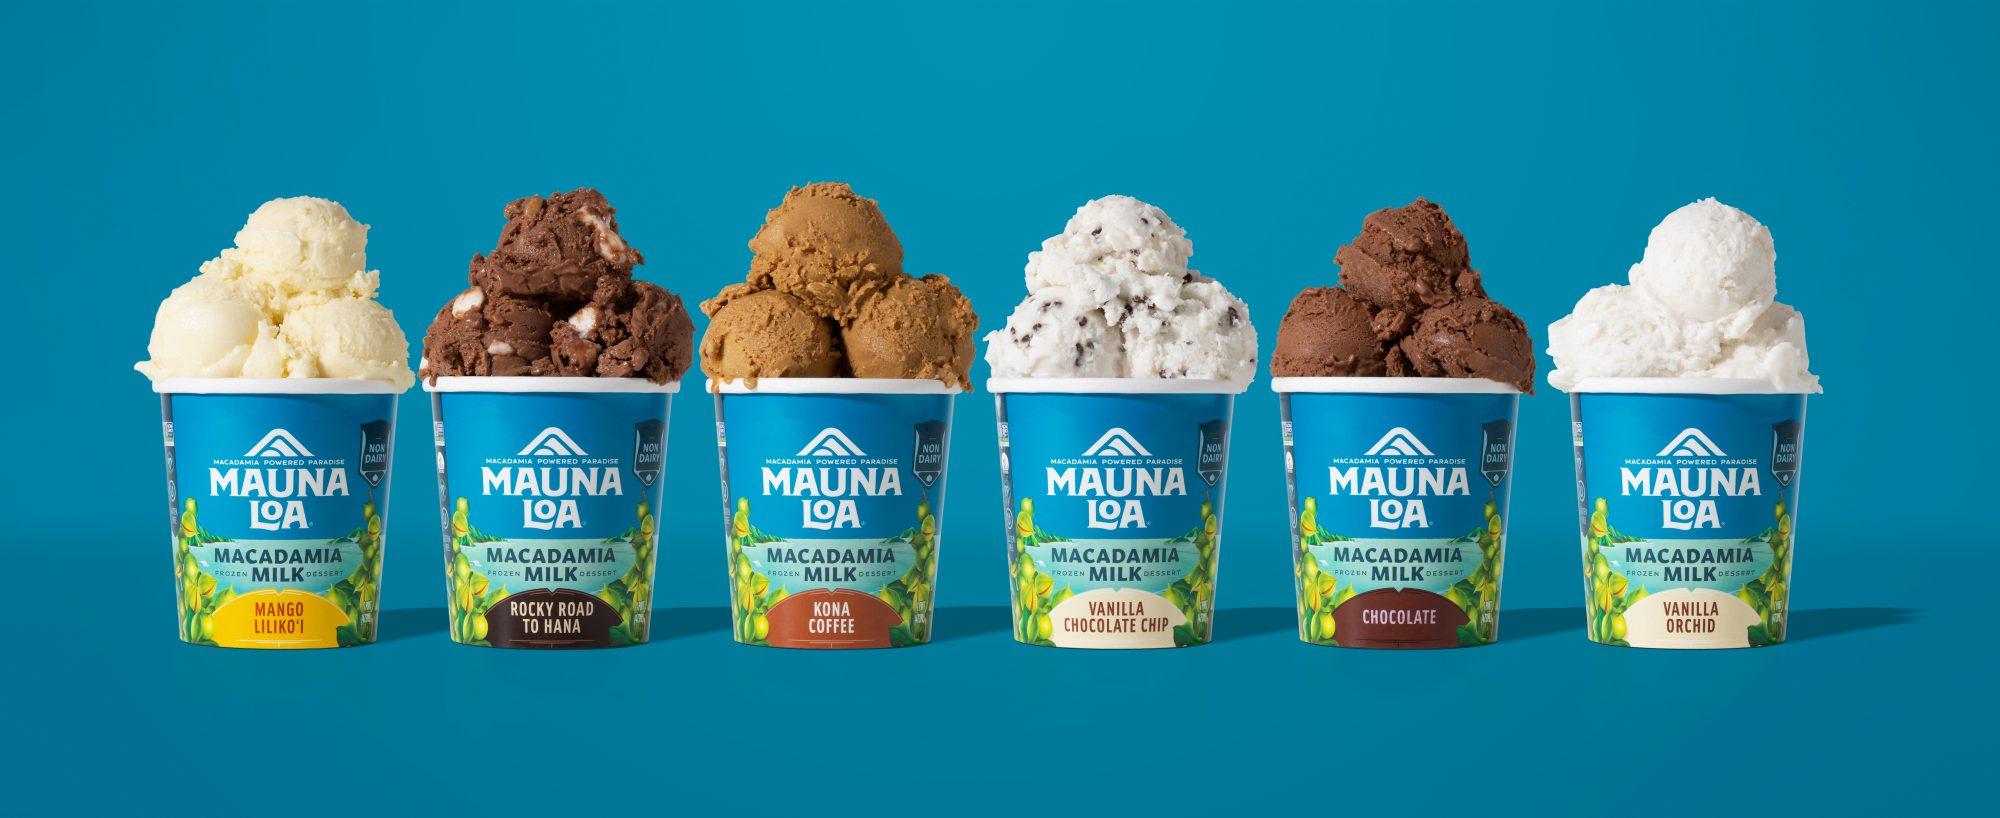 Mauna Loa Macadamia Nut Milk Ice Cream Lineup